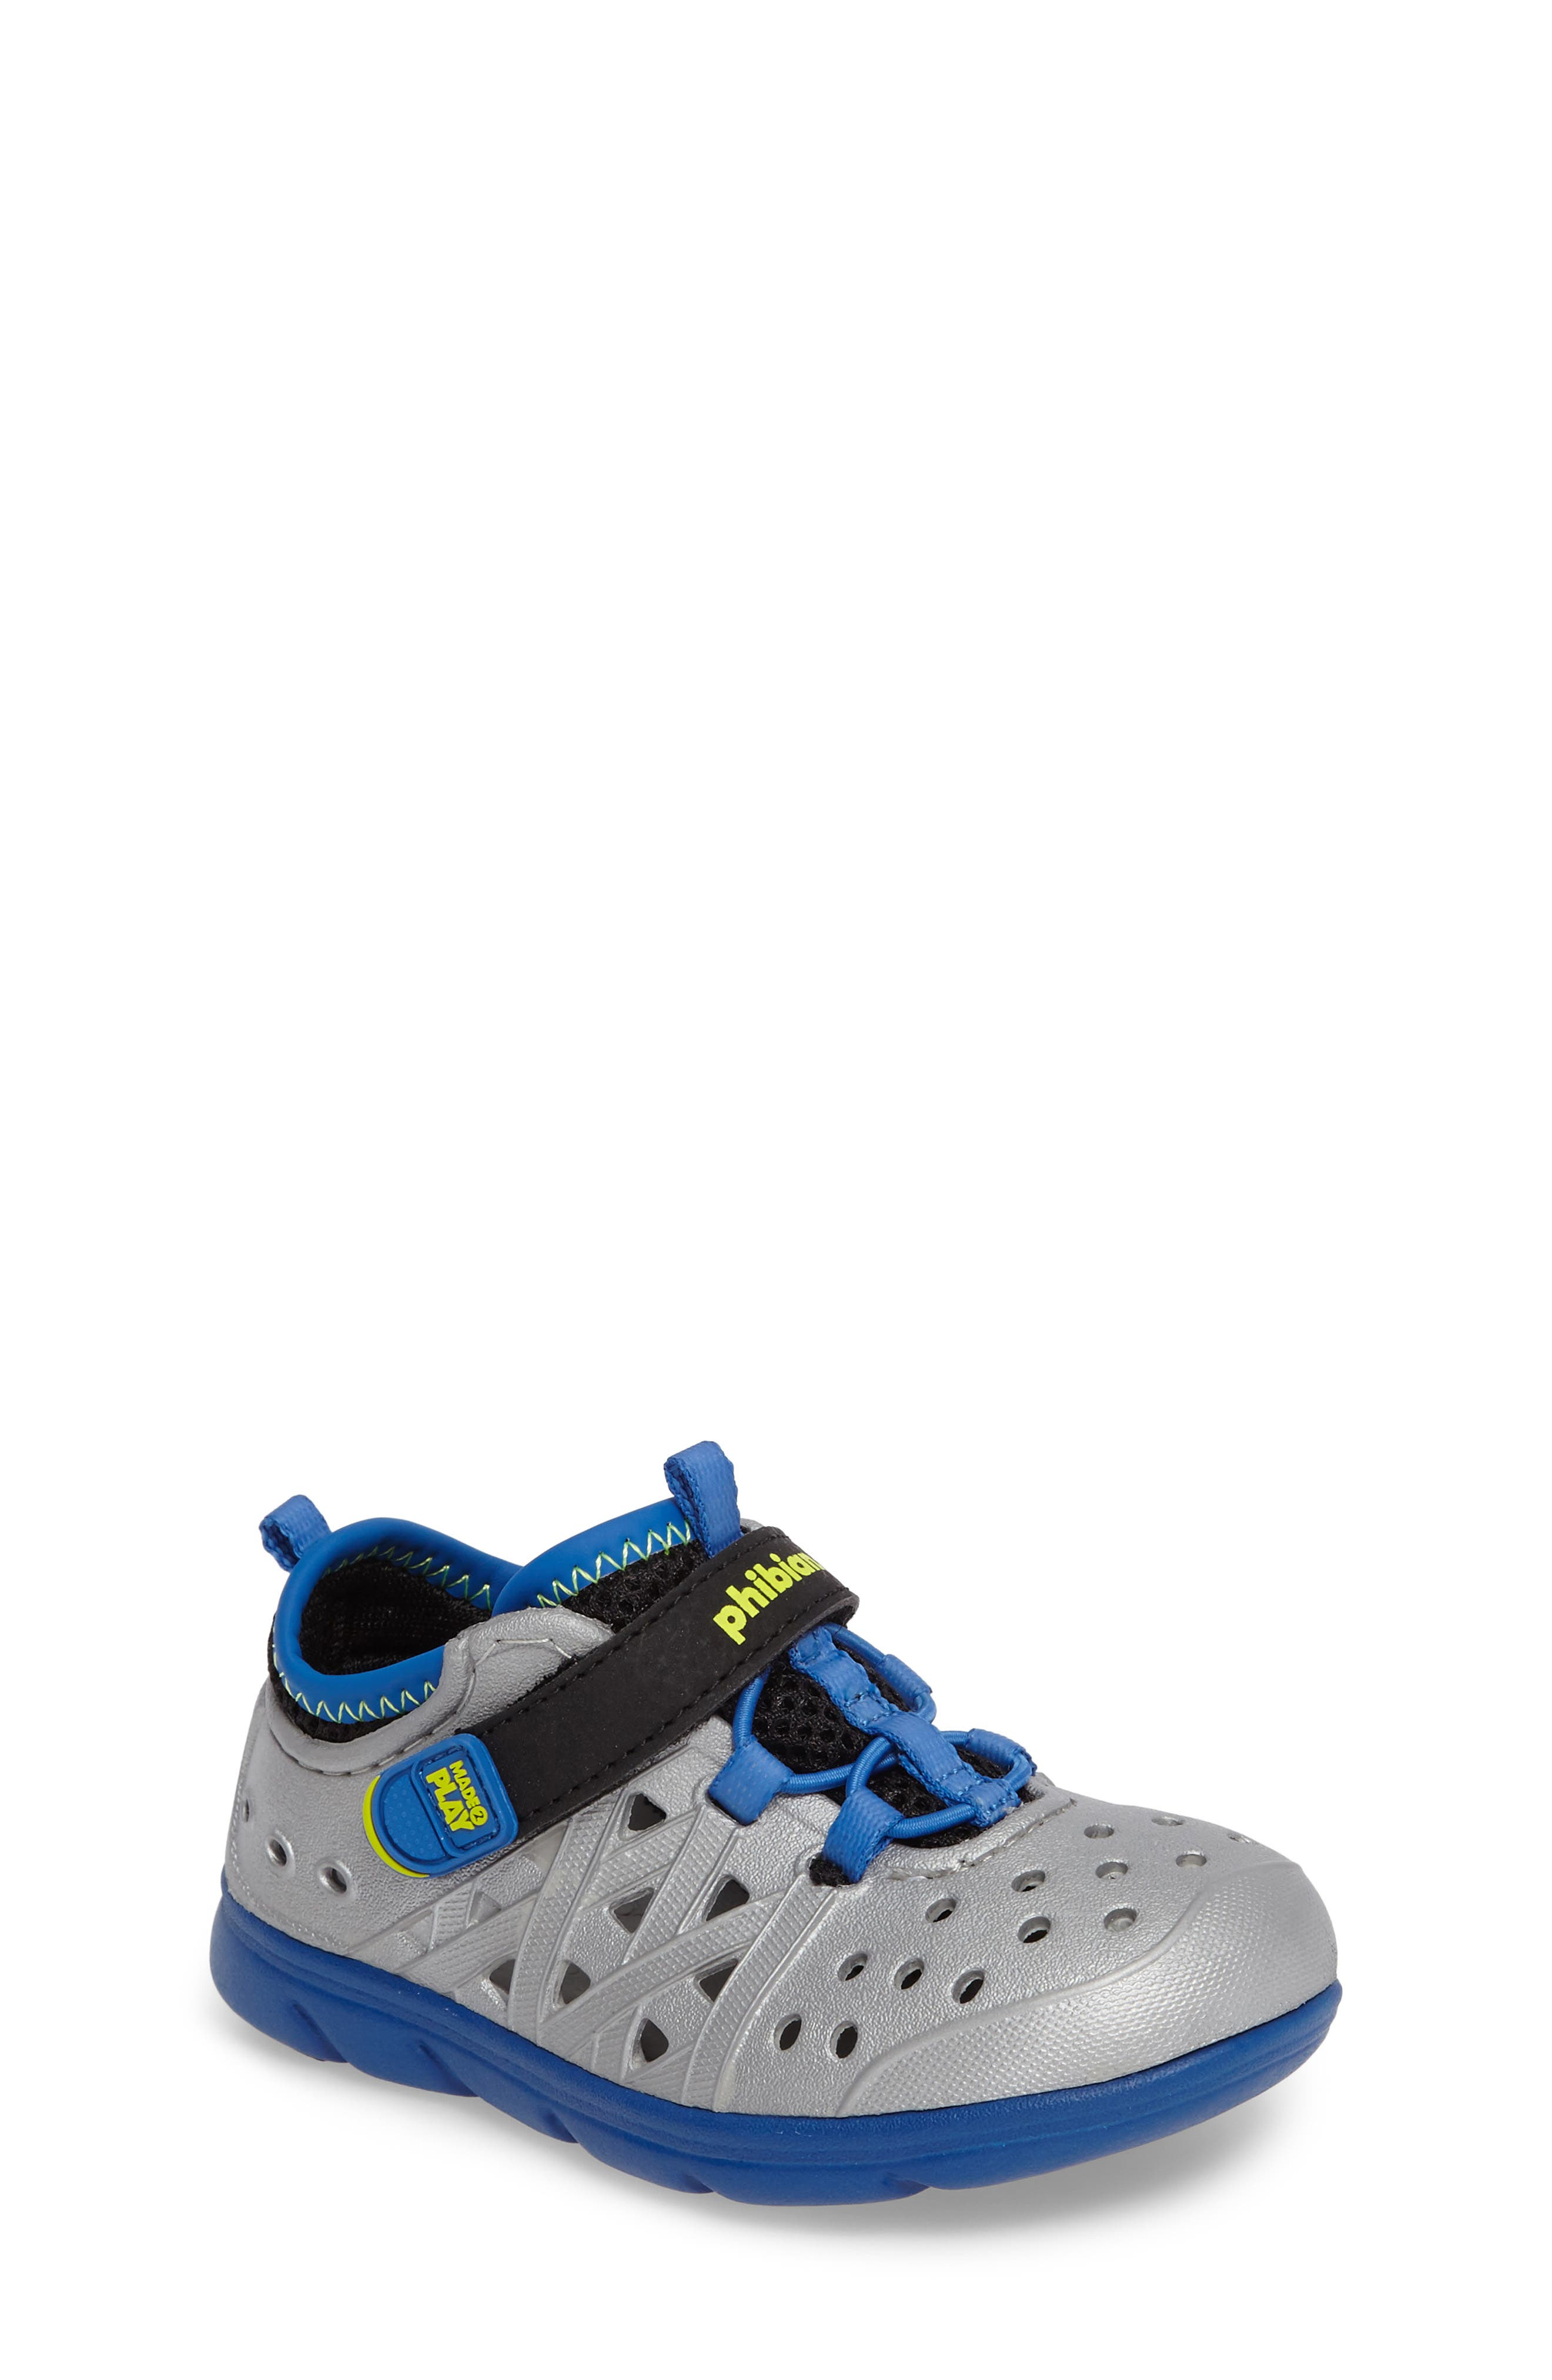 Made2Play<sup>®</sup> Phibian Sneaker,                             Main thumbnail 1, color,                             Silver Metallic